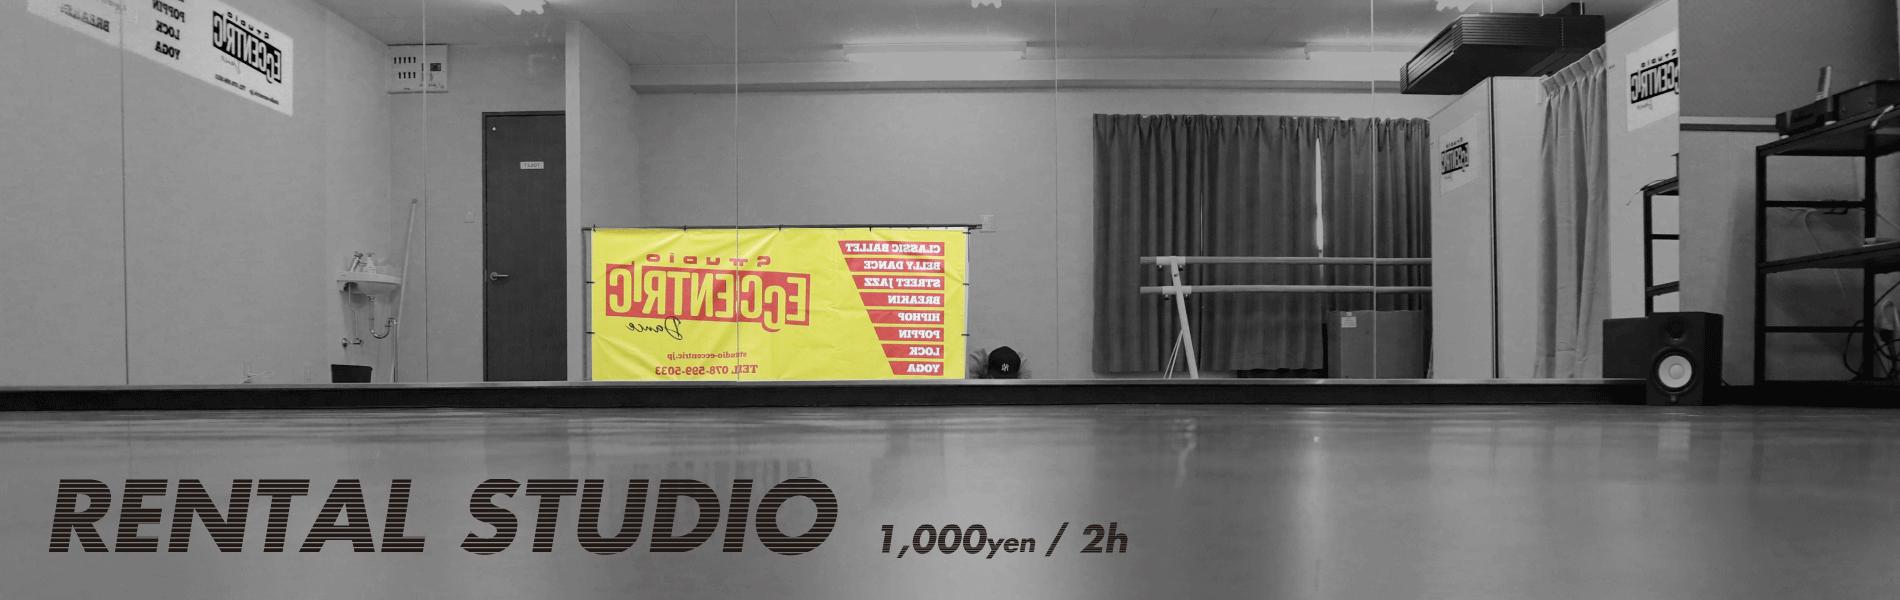 RENTAL STUDIO [1,000yen / 2h]